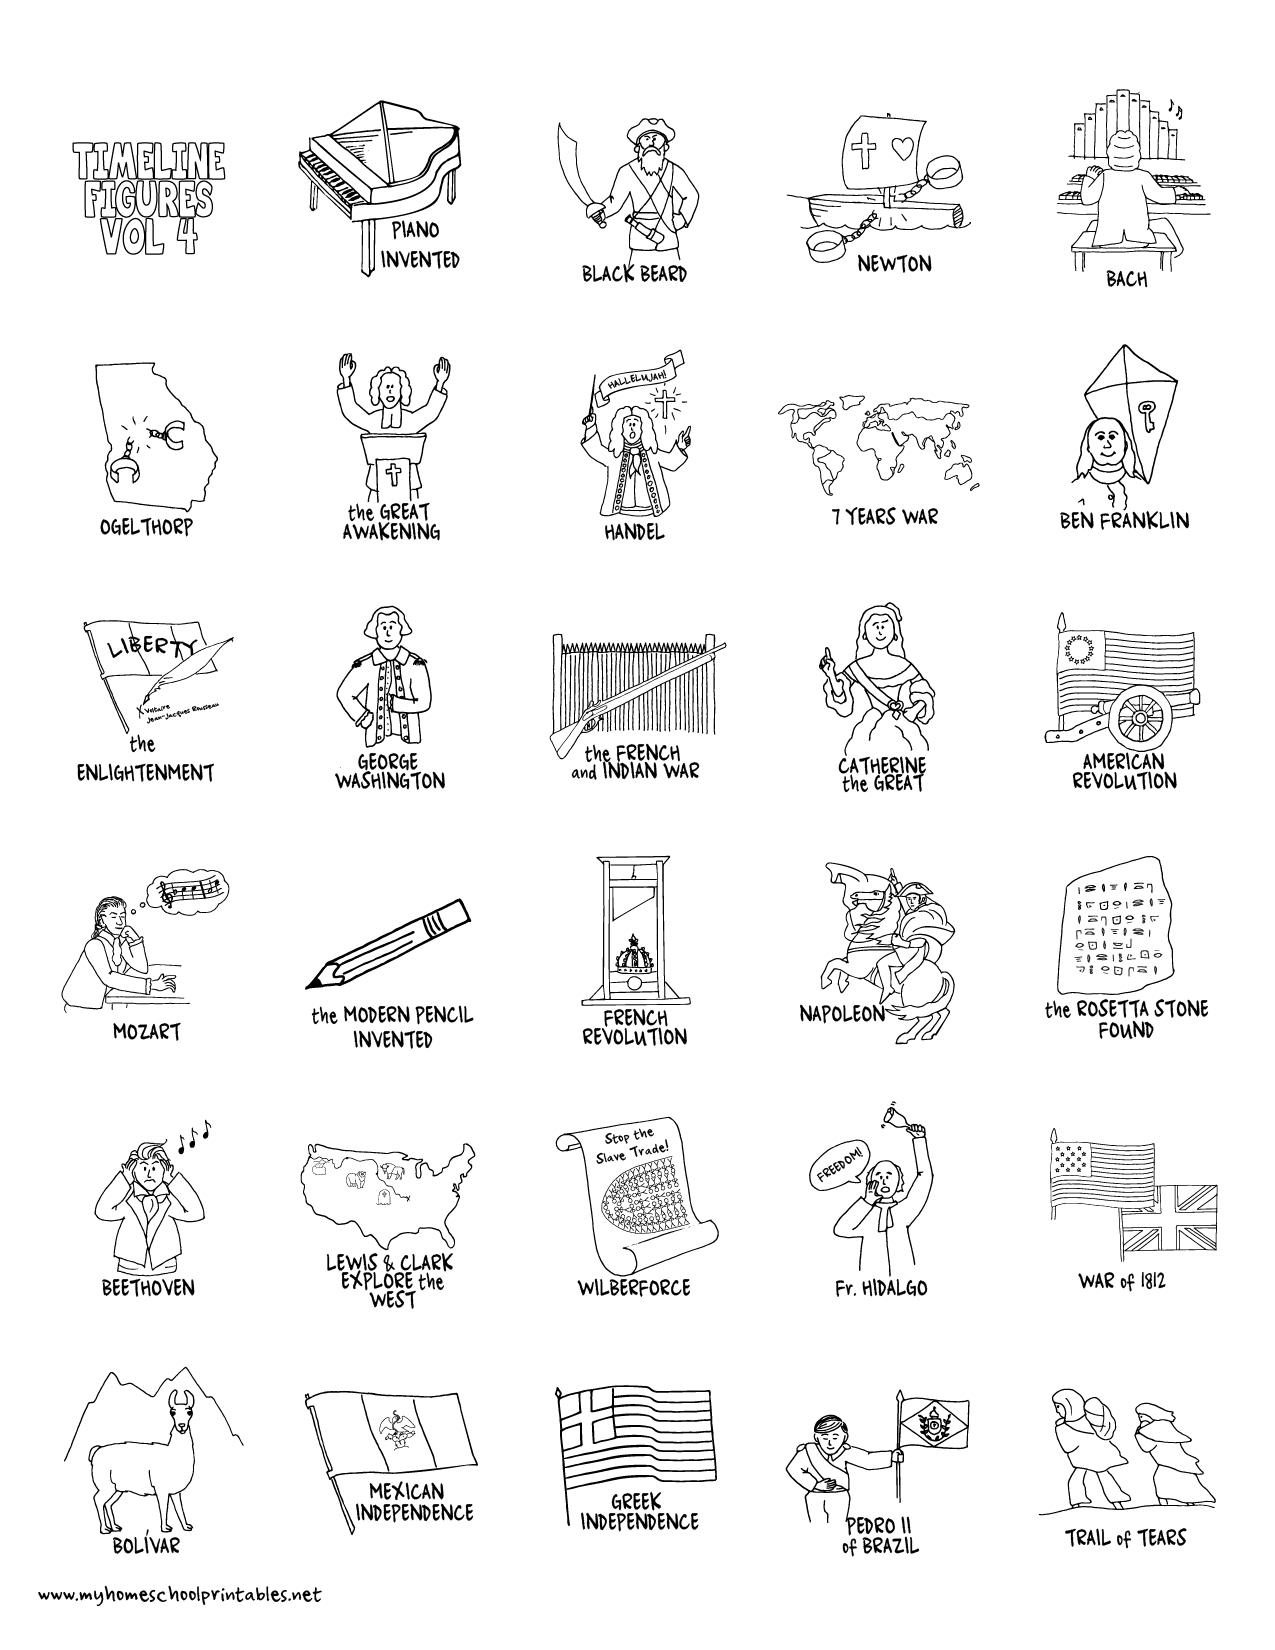 My Homeschool Printables » Timeline Figures – Volume 4 - Free Printable Timeline Figures